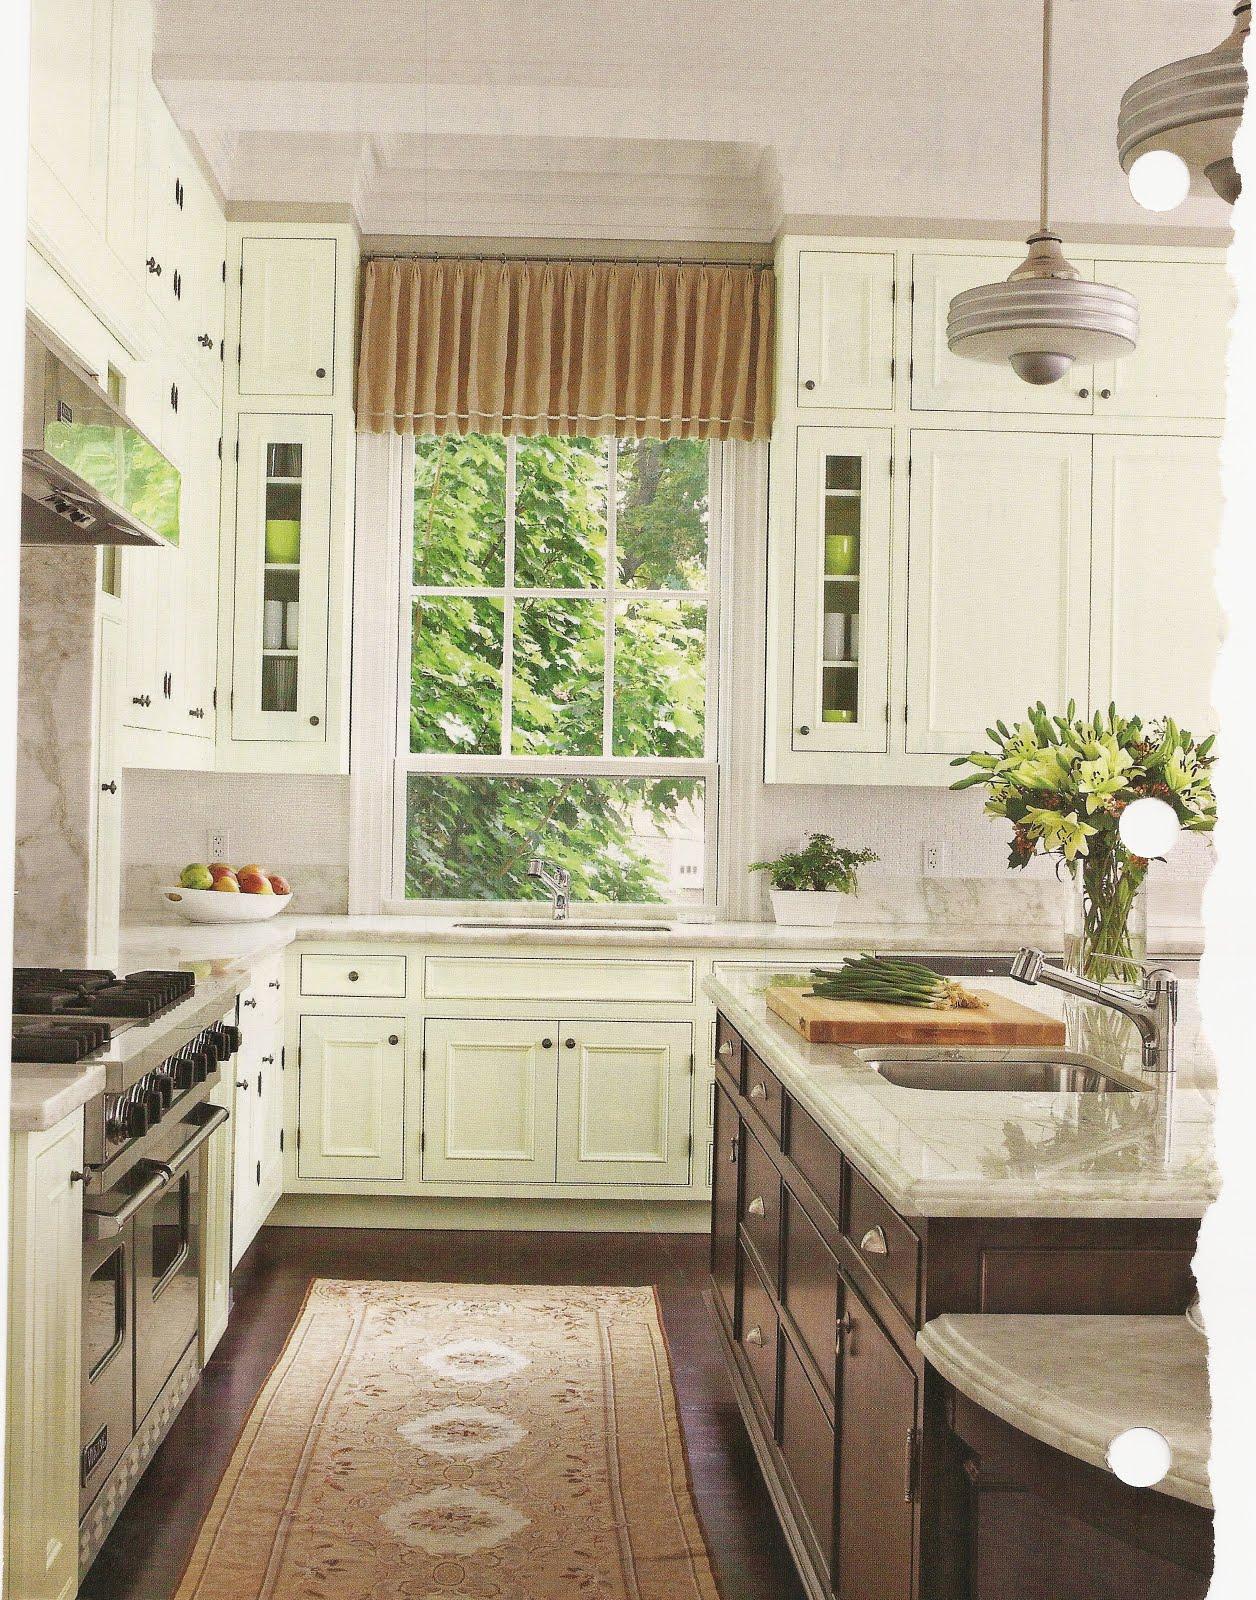 casa forney: kitchen cabinets